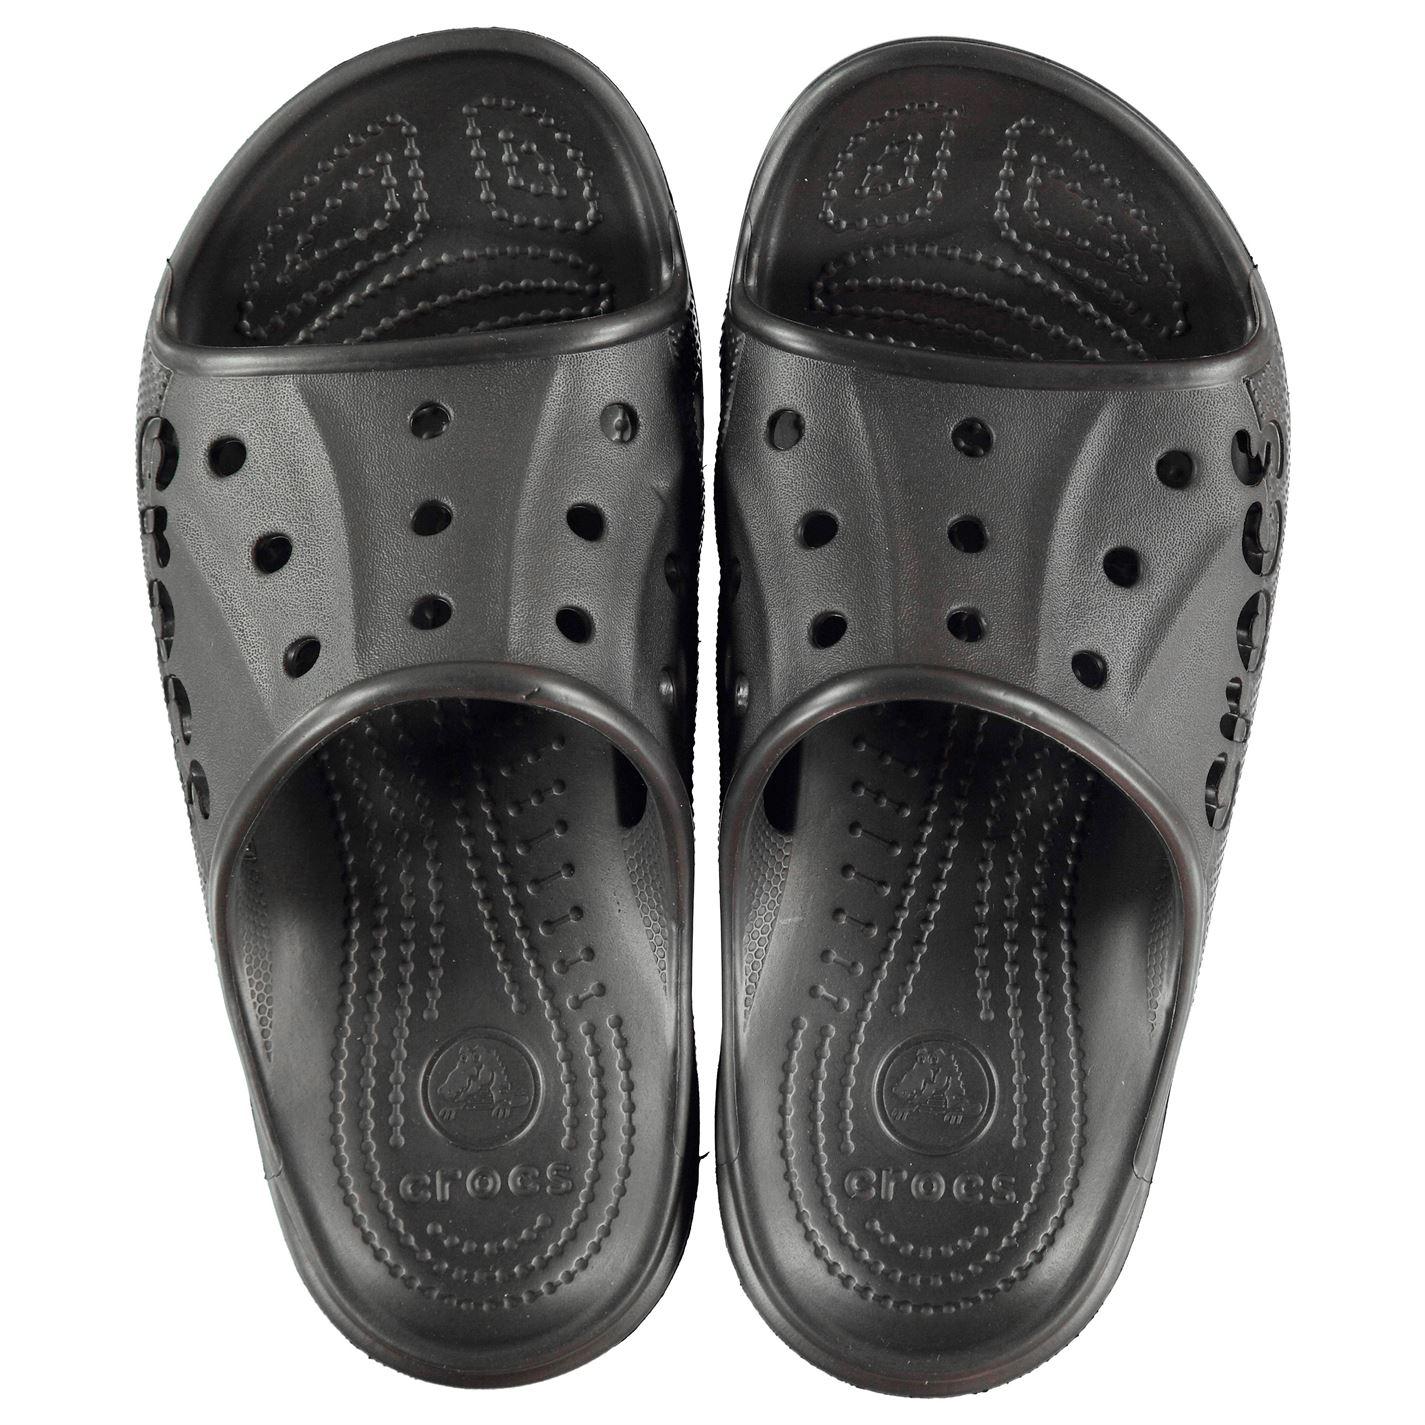 898402637c9 Crocs Mens Baya Slide Pool Shoes Slip On Strap Ventilation Holes ...